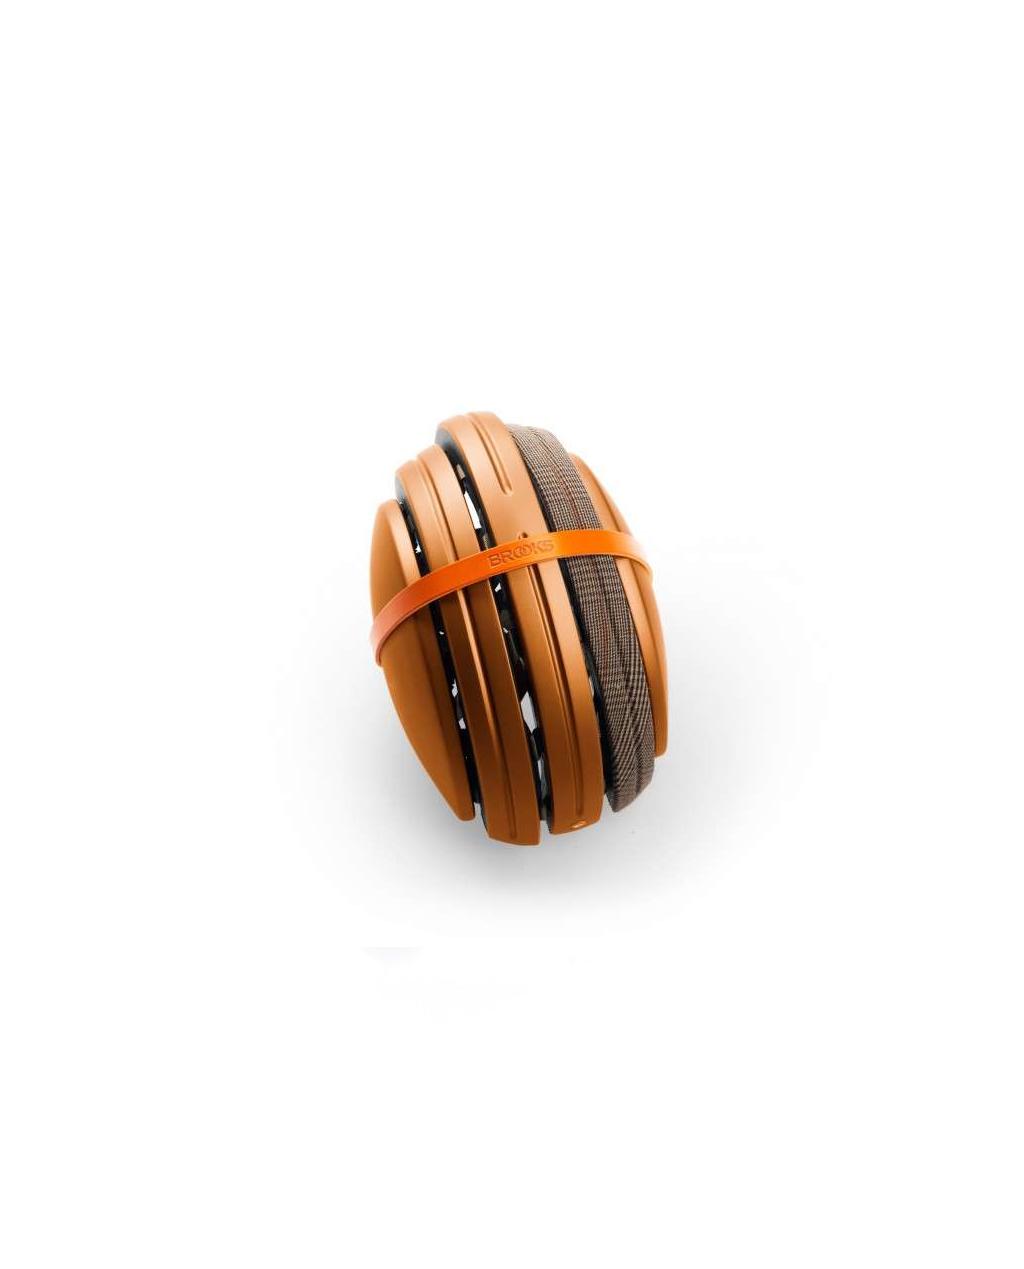 Brooks - Carrera Foldable Helmet - Copper / Brown Prince of Wales